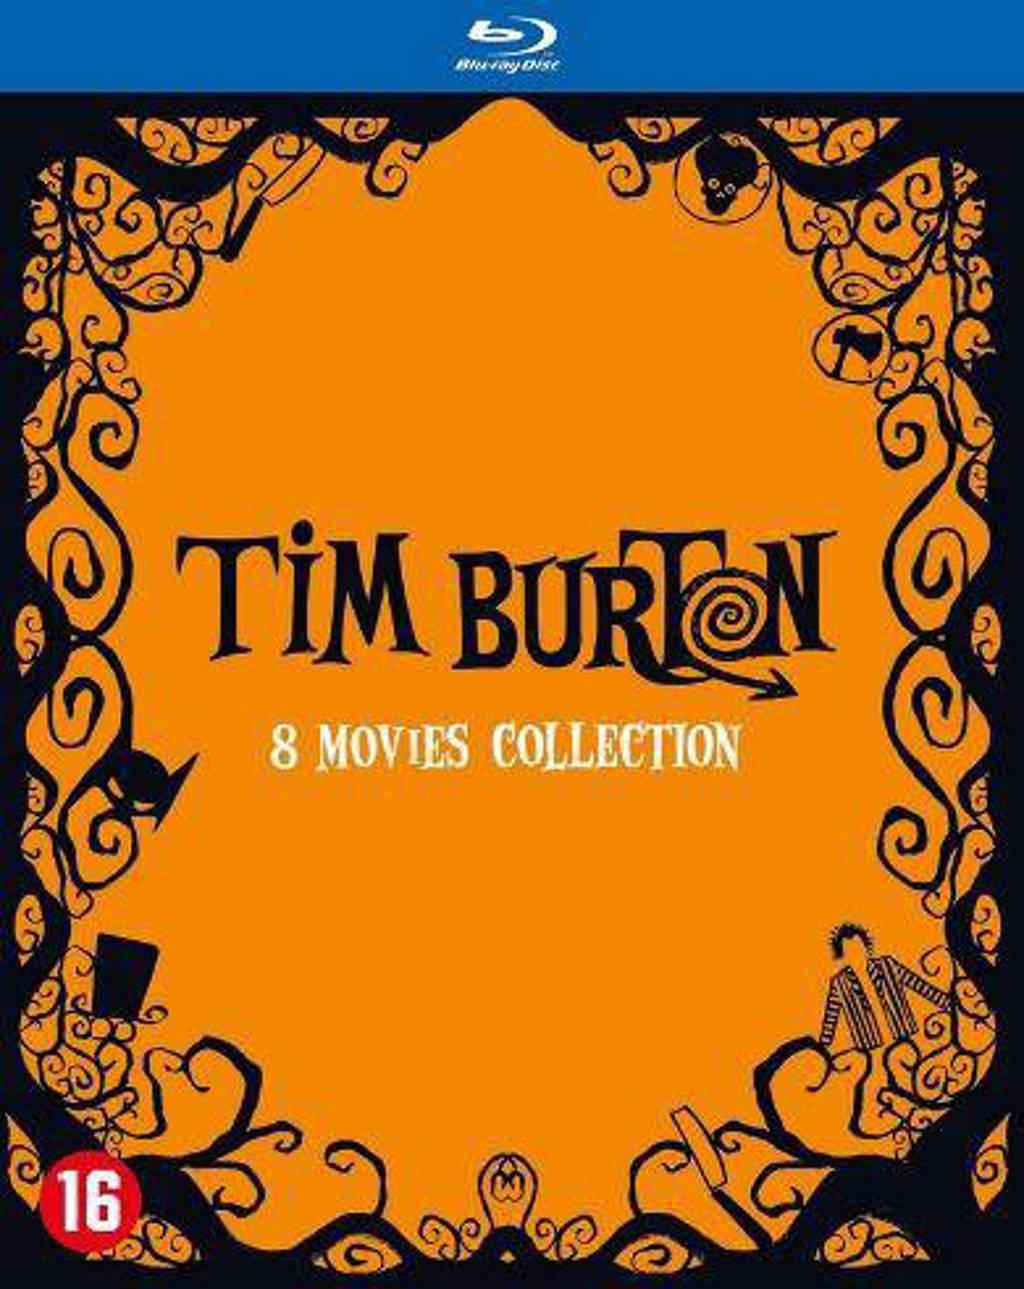 Tim Burton collection (Blu-ray)